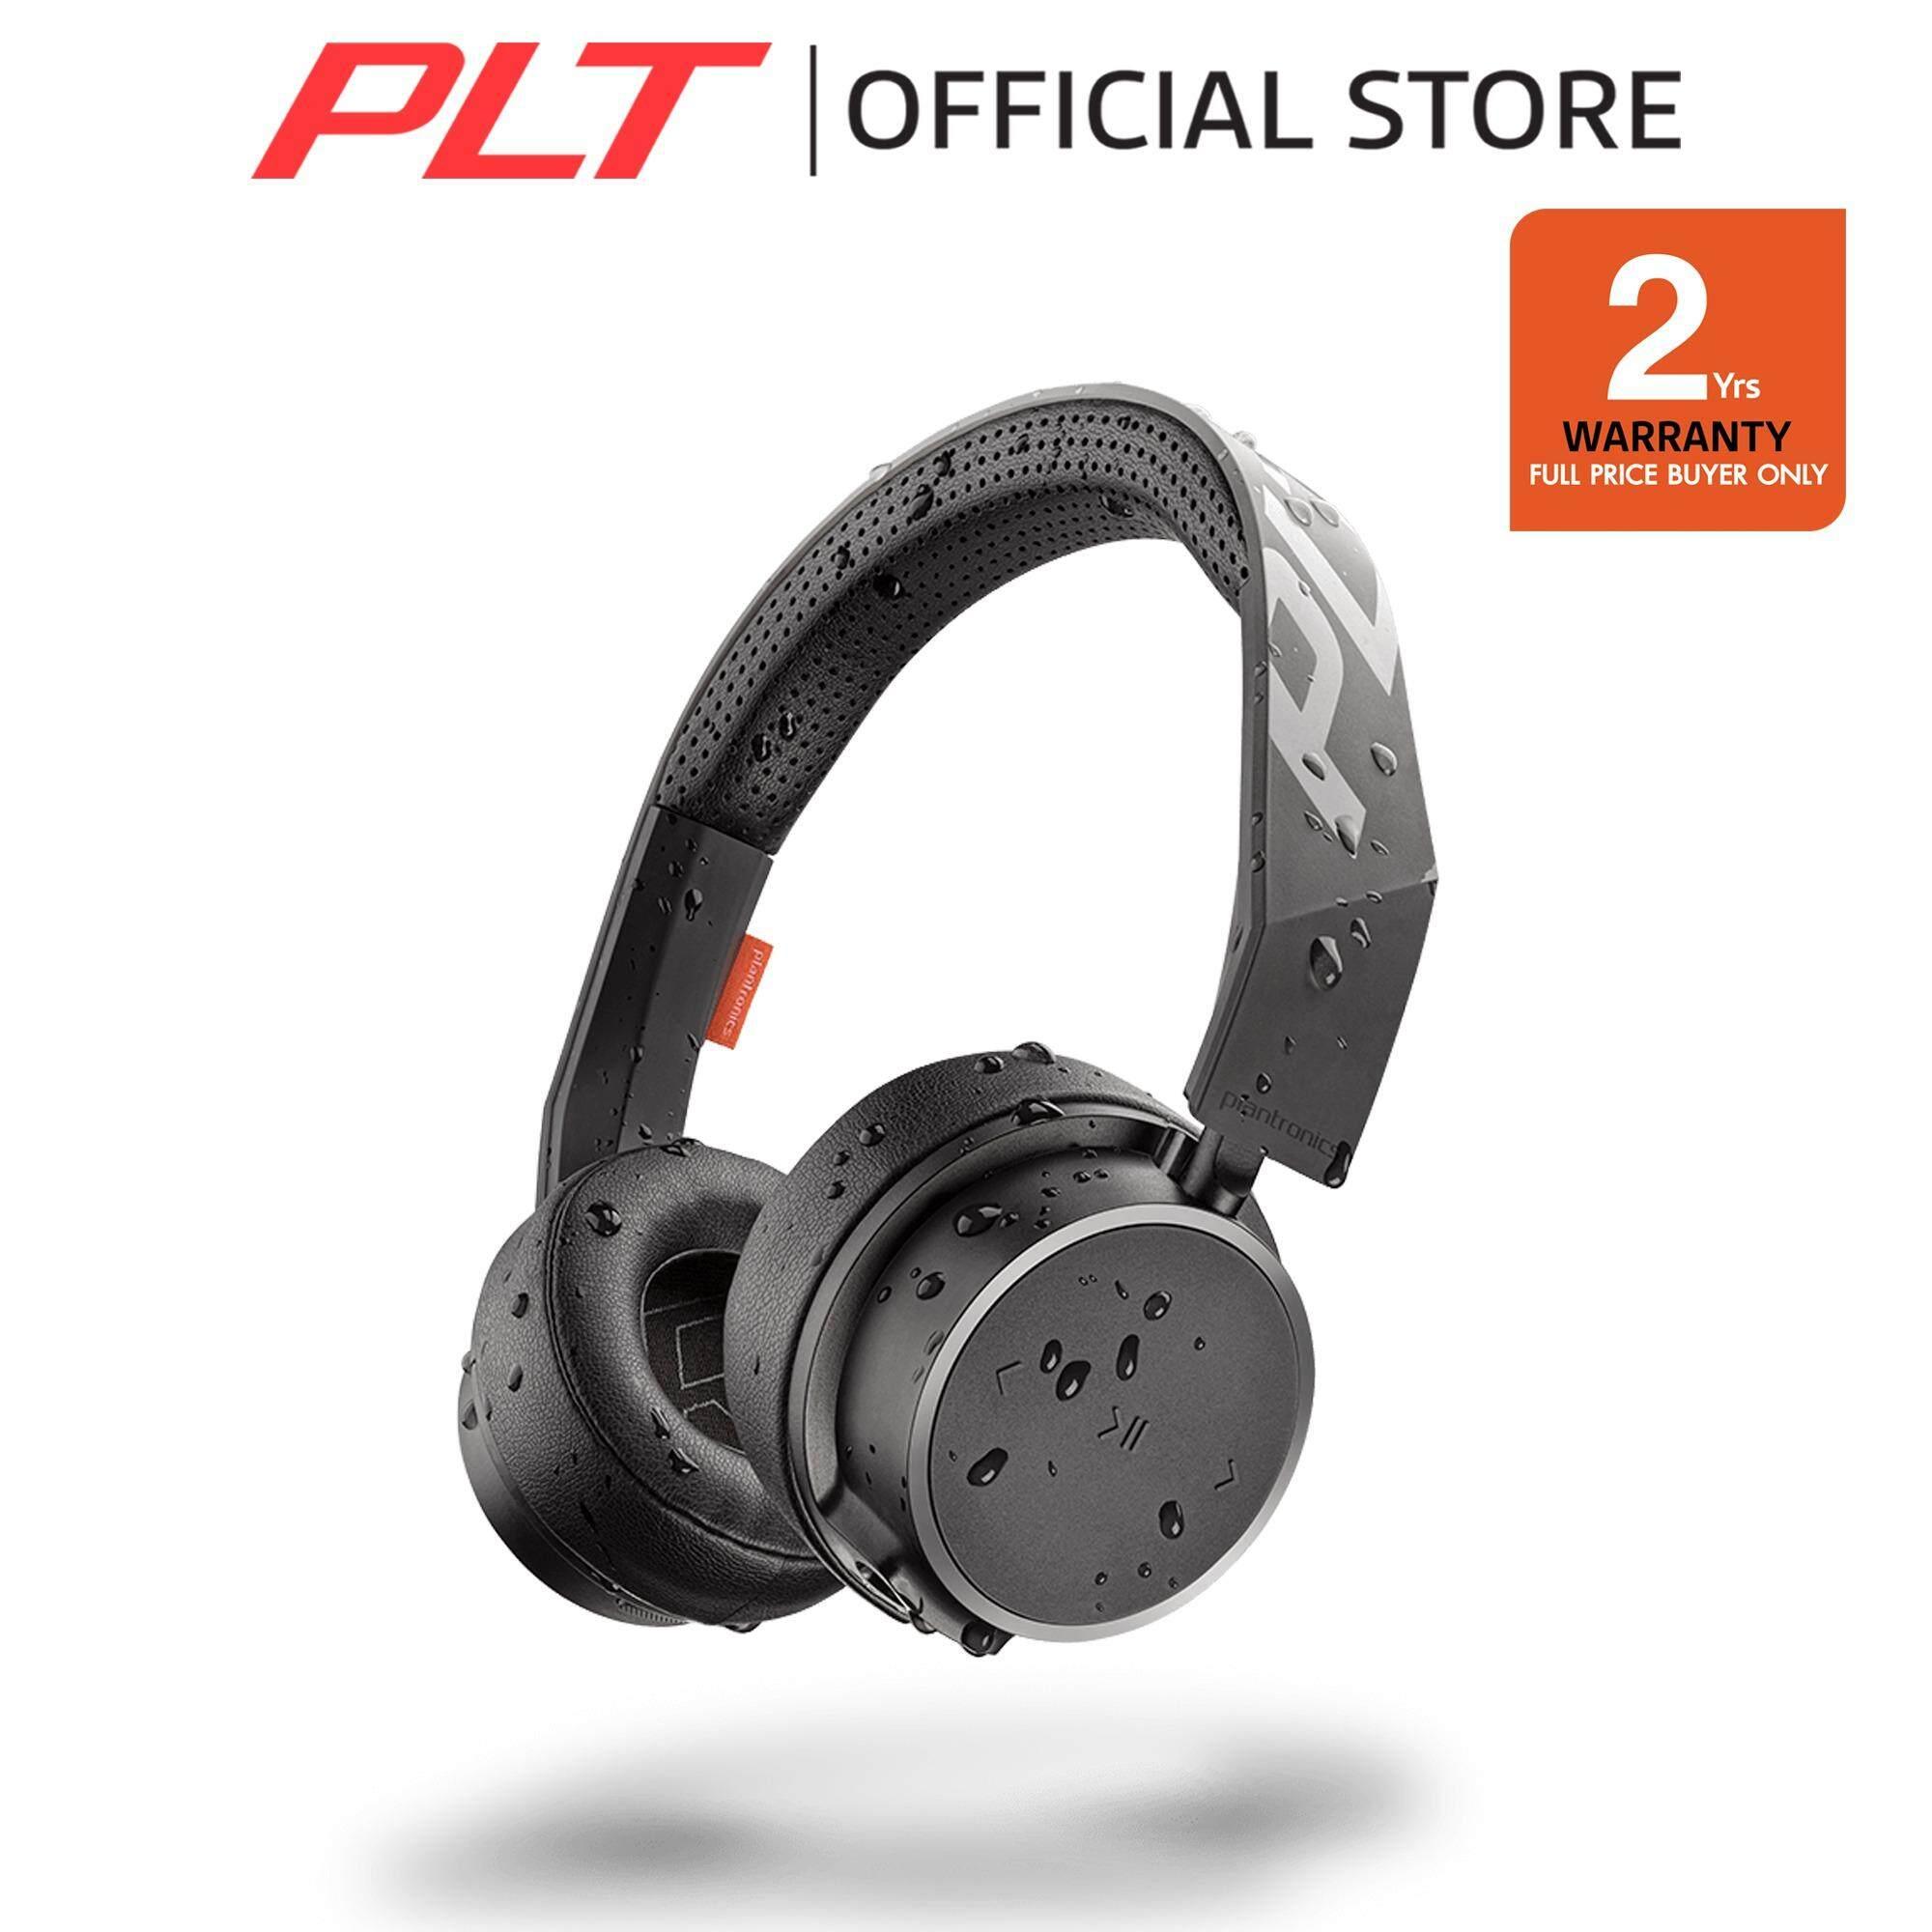 Plantronics BackBeat FIT 505 (Black)